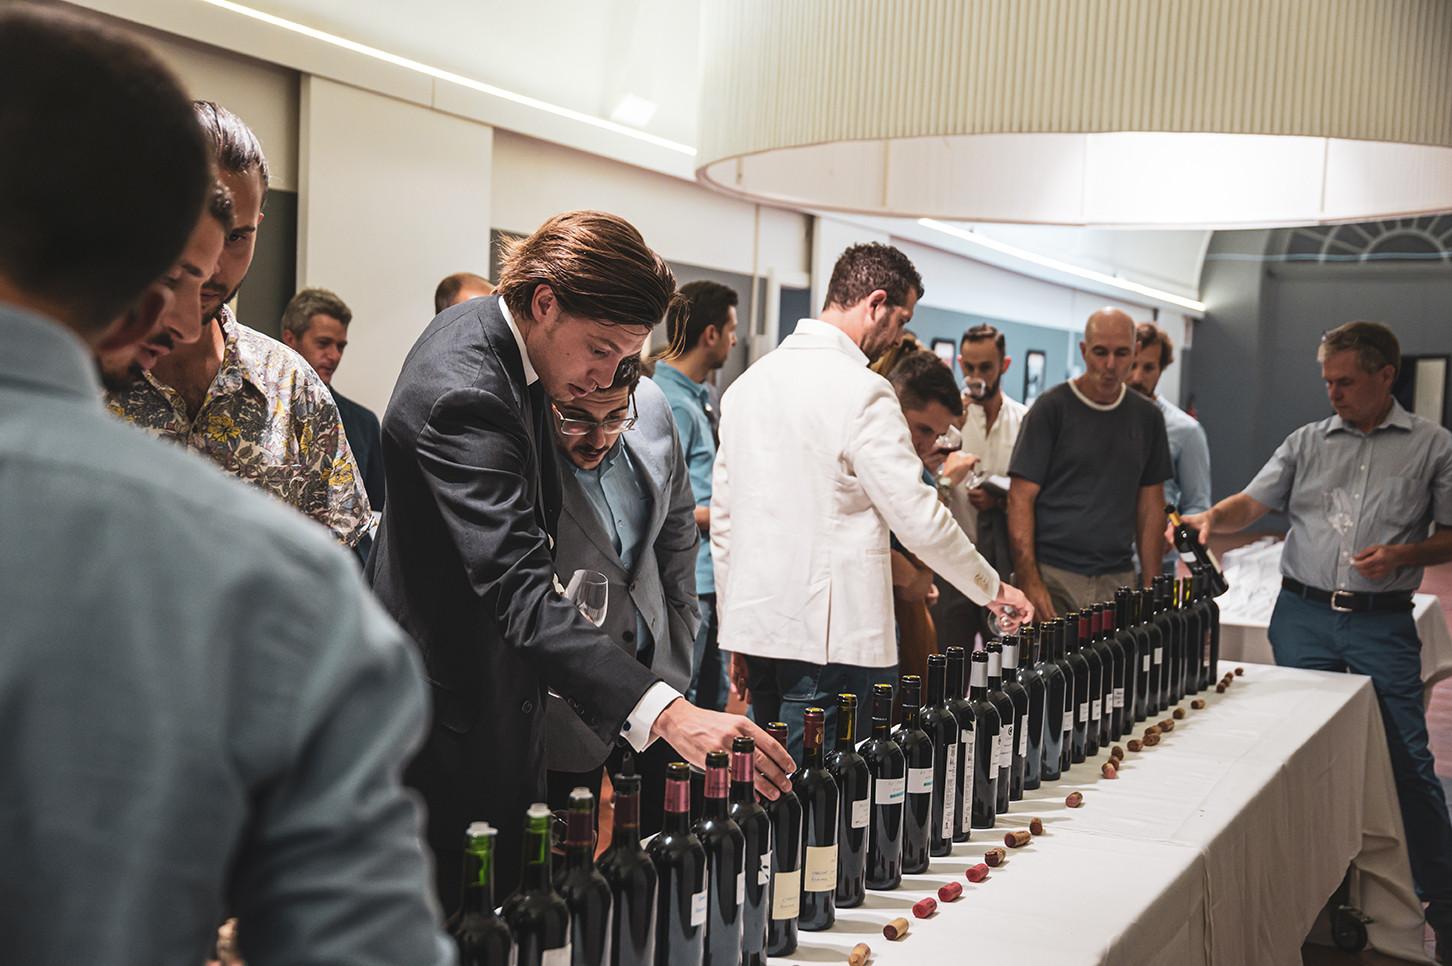 Technical tasting of wines en élevage with Tonnellerie Baron for Brunello producers   Photo © Elis Taflaj